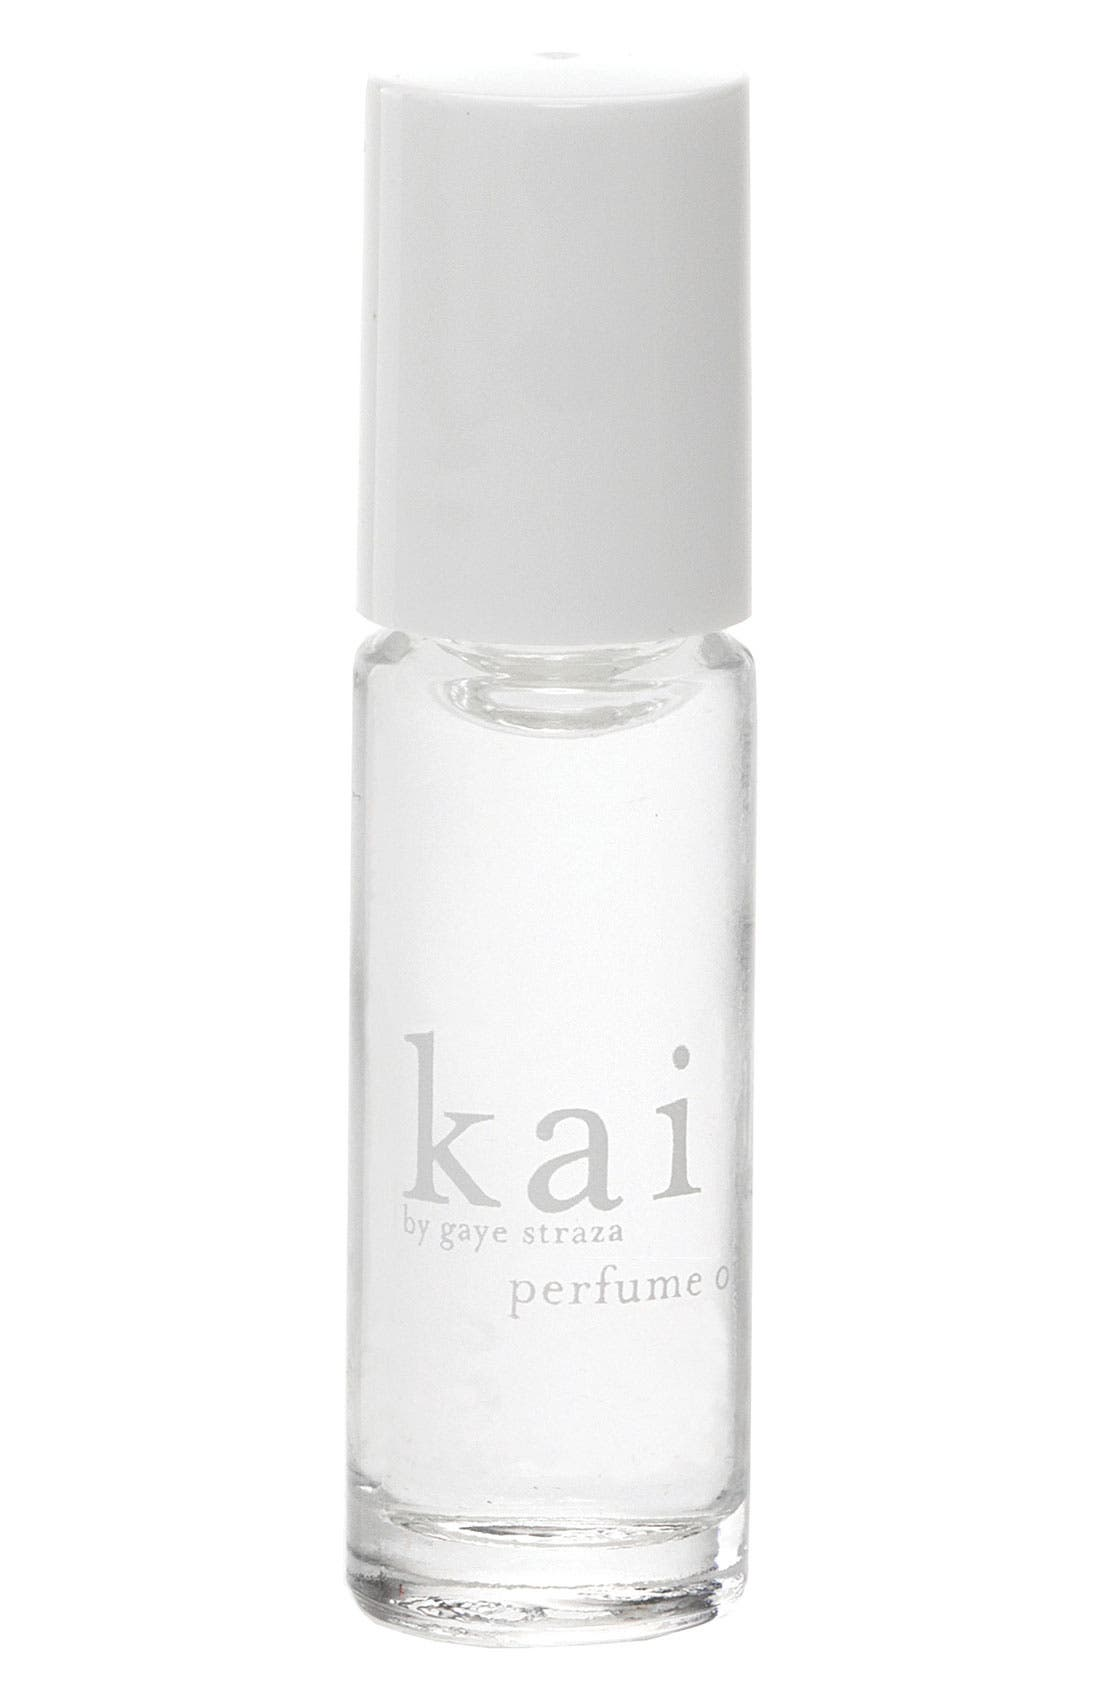 Perfume Oil Rollerball